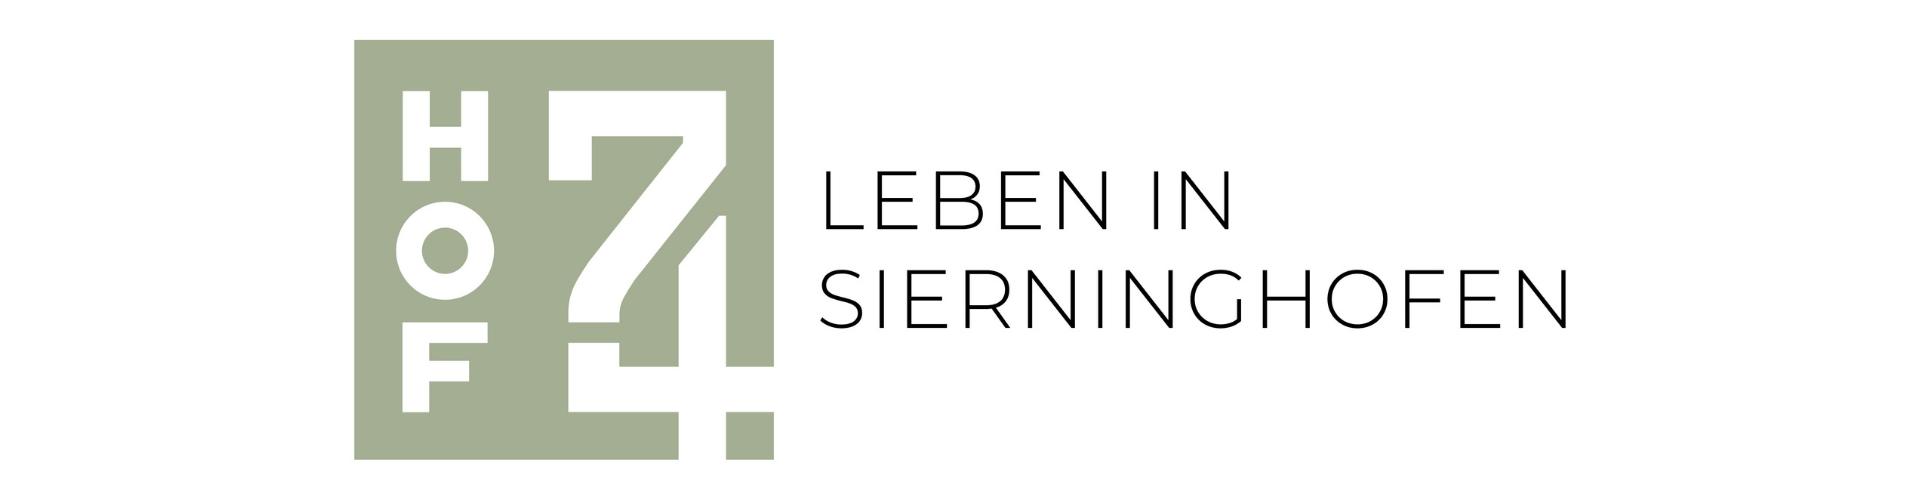 Titelbild Hof 74 Leben in Sierninghofen